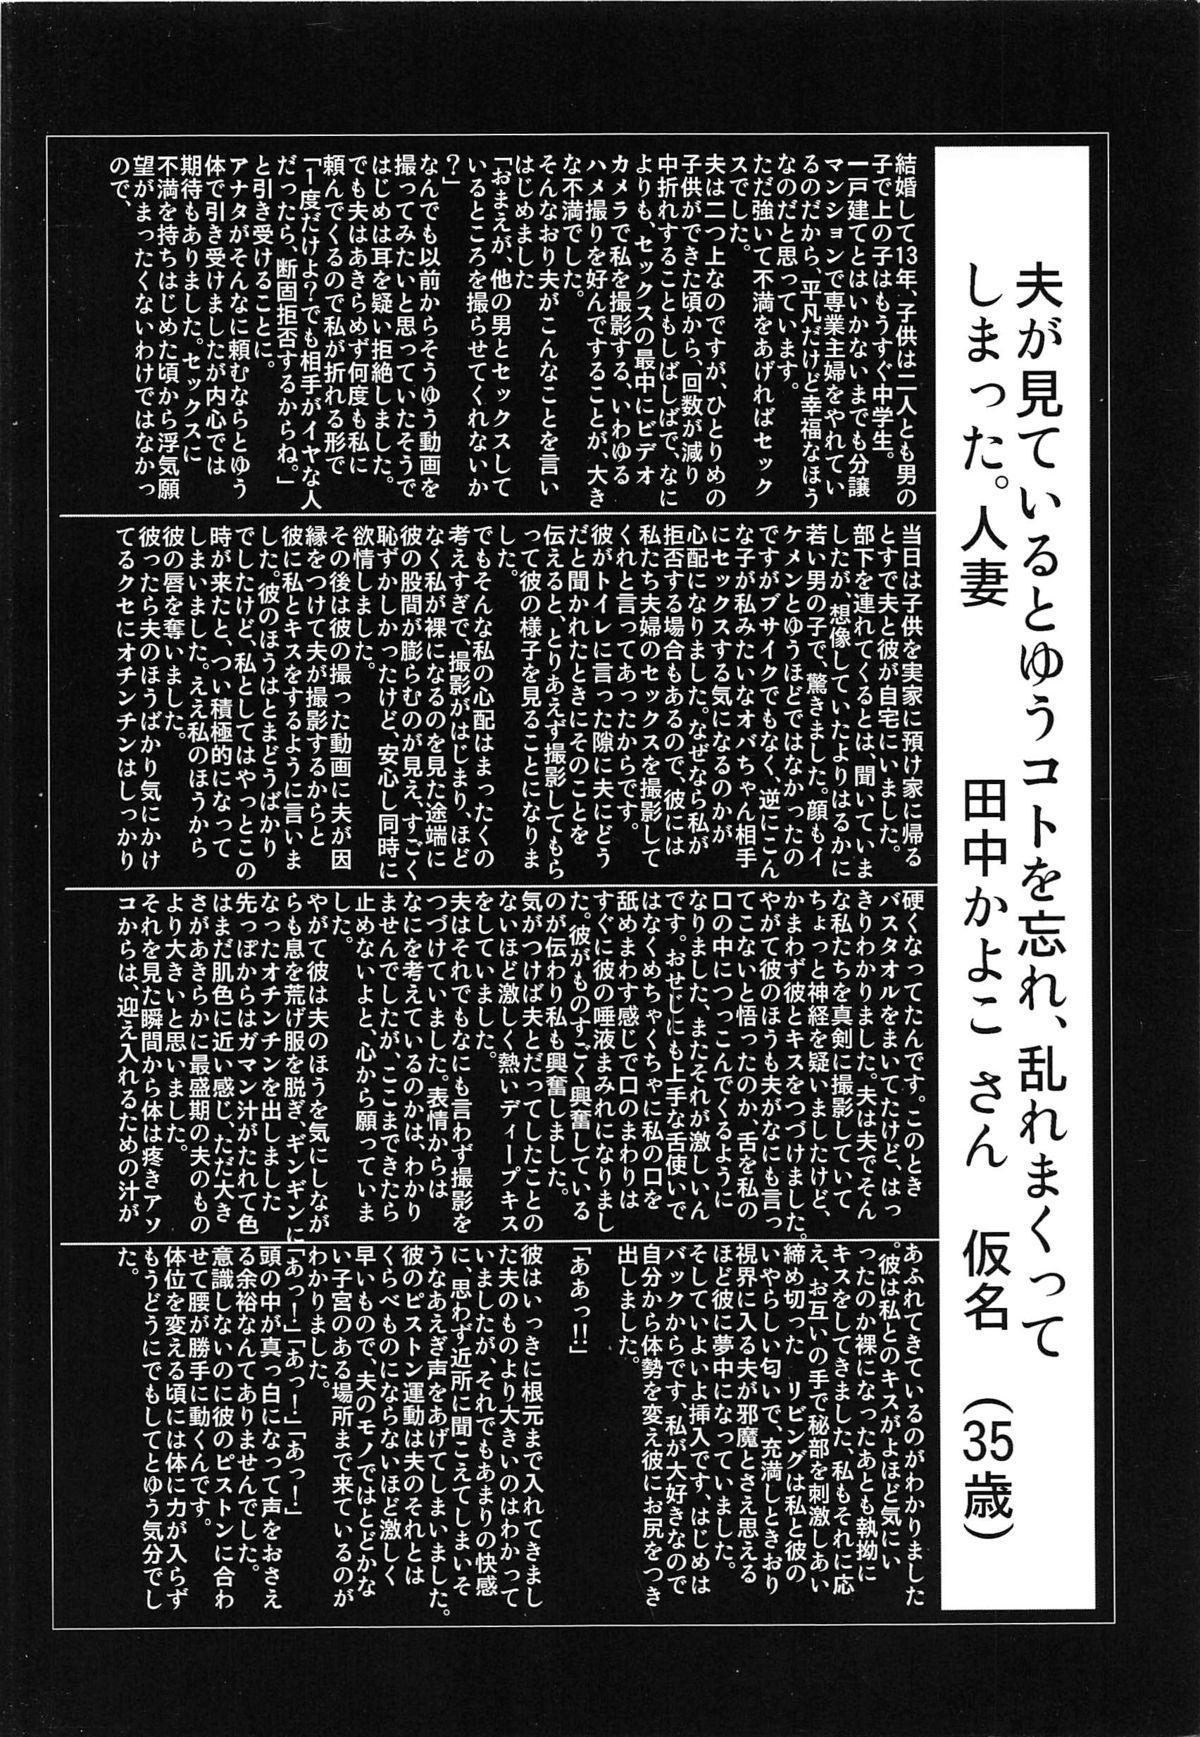 [Kuroki Hidehiko] 35 Sai Yarigoro Zuma | 35-Year-Old Ripe Wife [English] {Tadanohito} [Decensored] 6